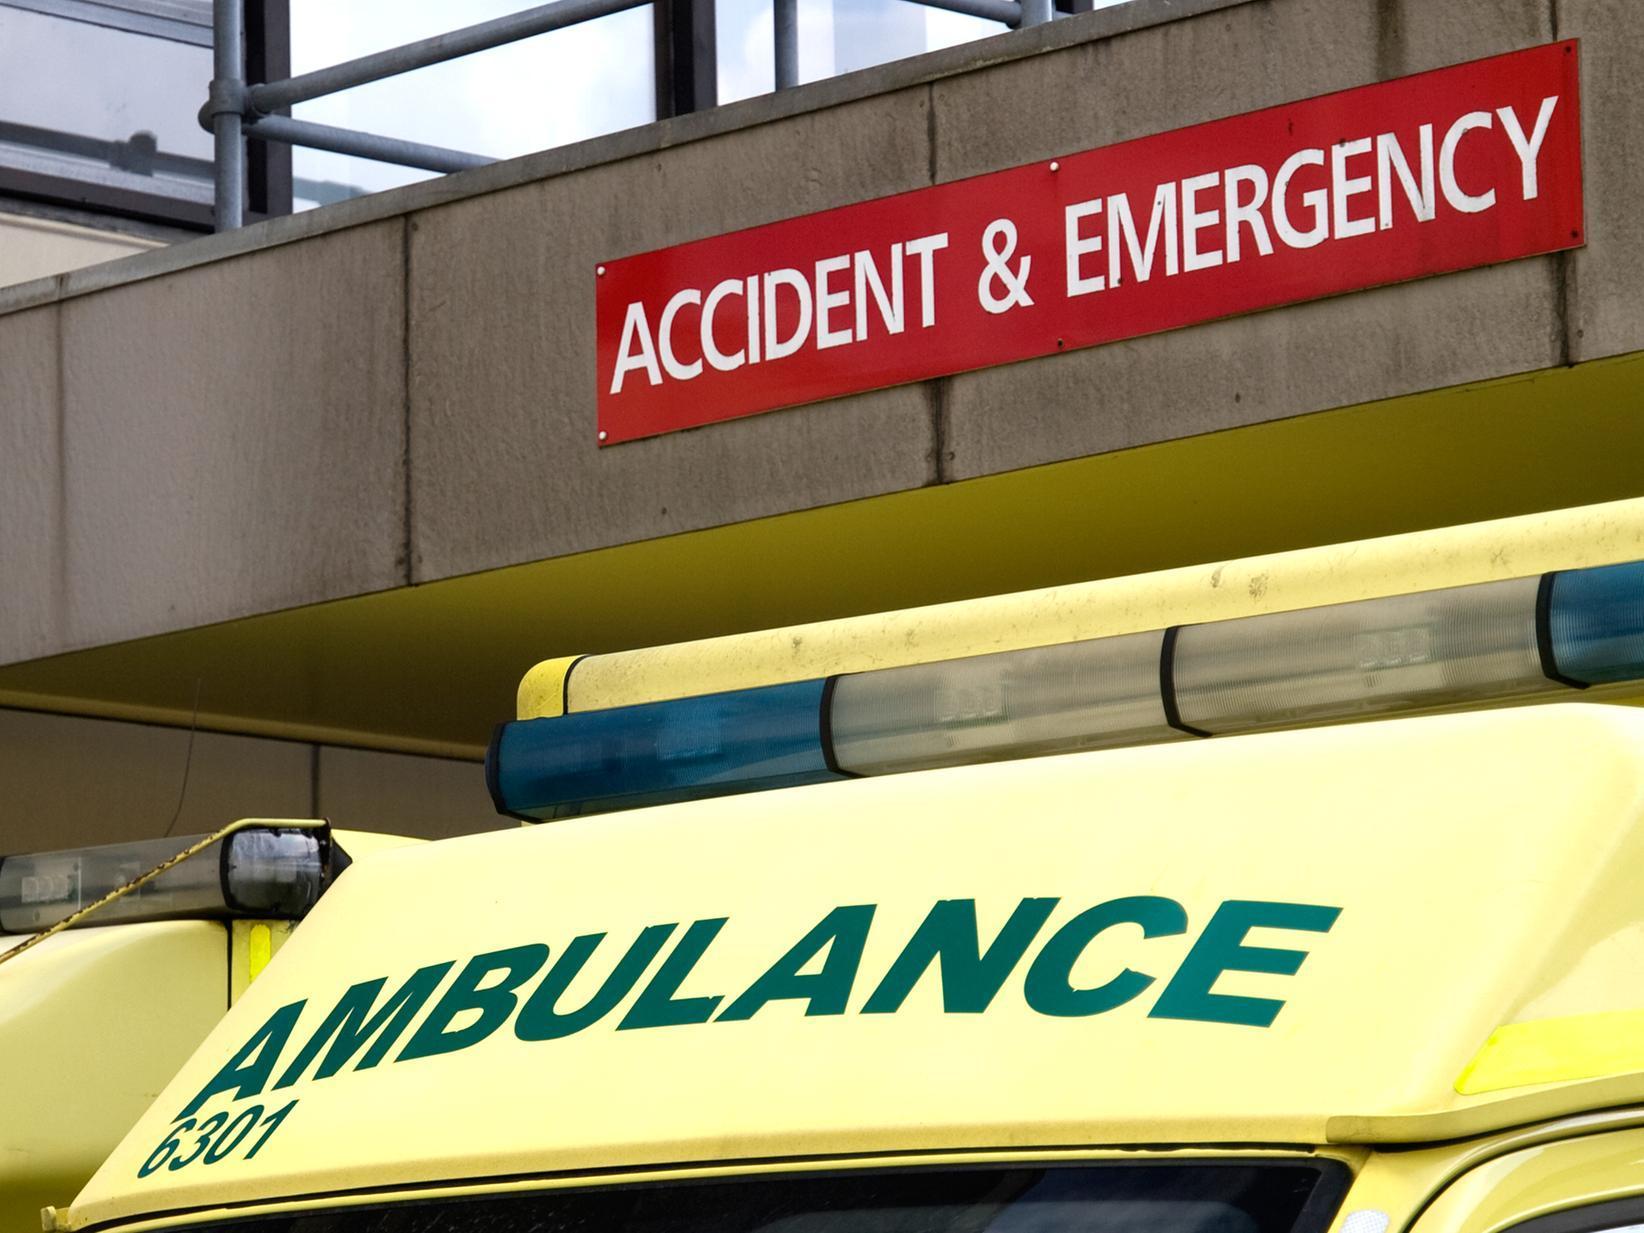 Leeds A&E departments failing to meet four-hour waiting time target